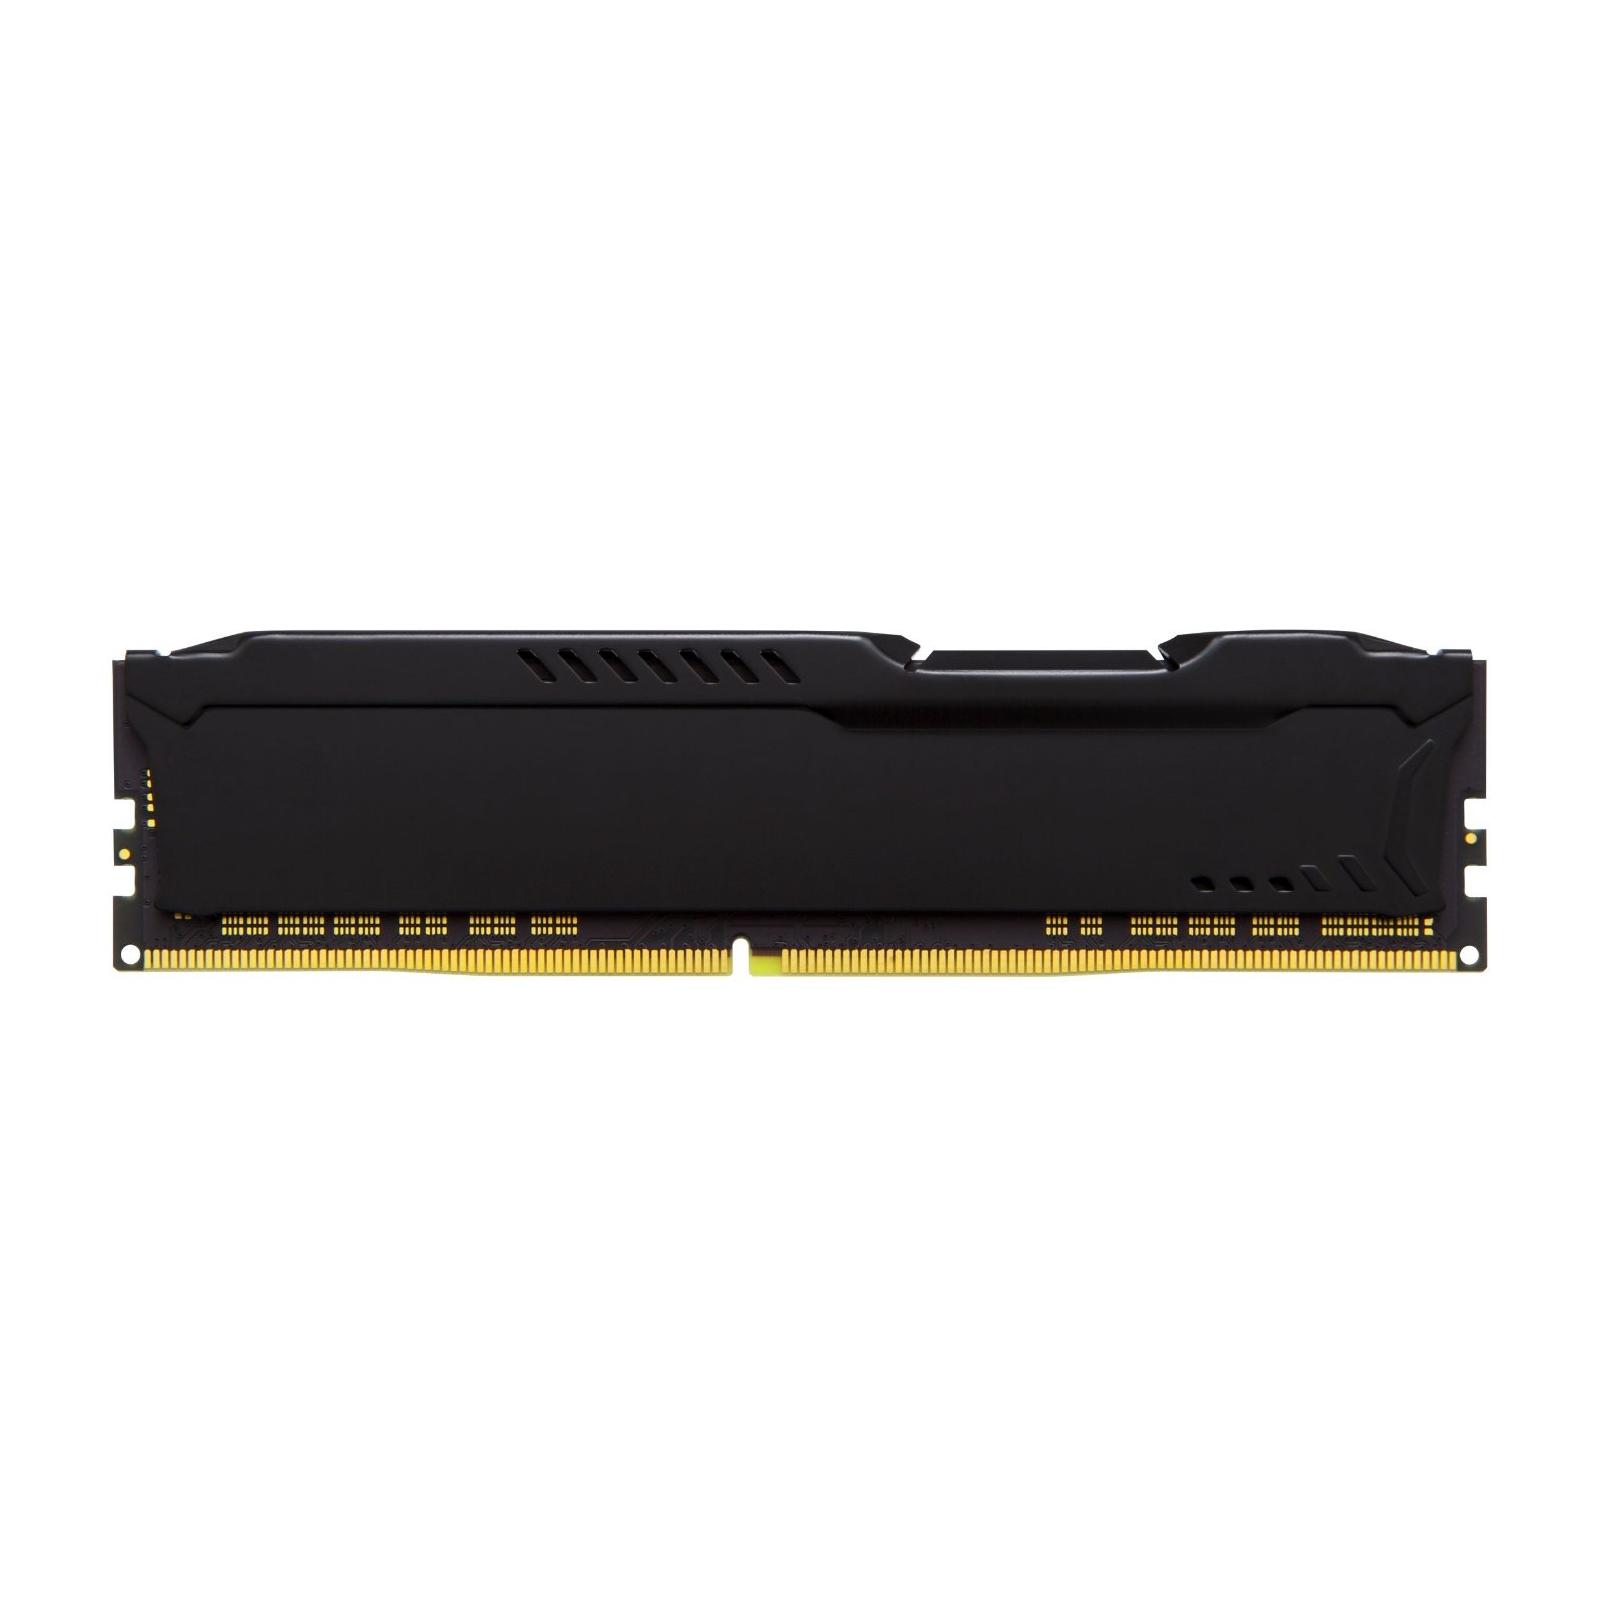 Модуль памяти для компьютера DDR4 16GB 2133 MHz Fury Blac Kingston (HX421C14FB/16) изображение 3